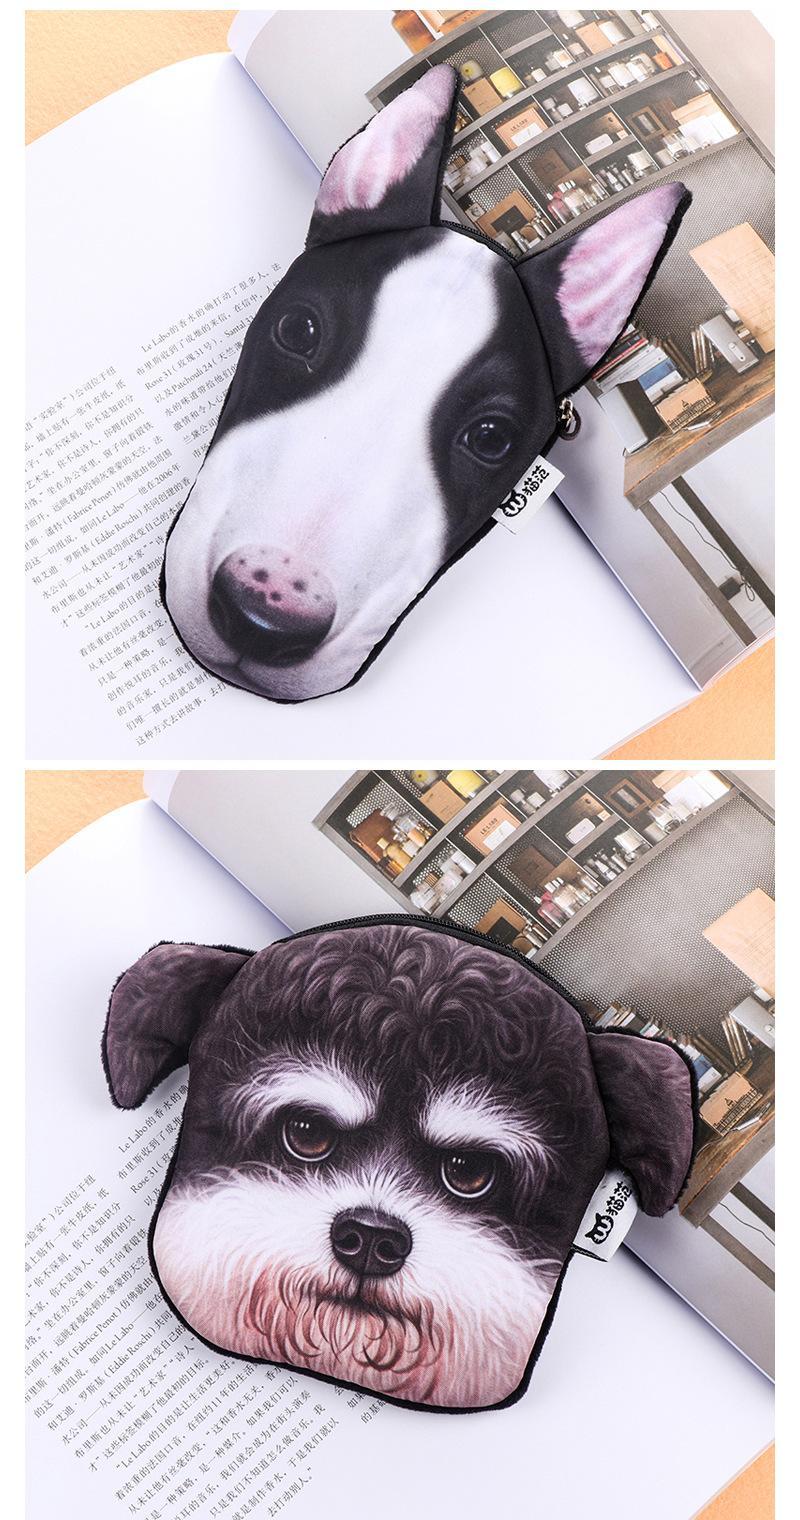 Fashion Child Animal Coin Purses Holders 3D Dog Purse For Coins Women Coin Bag Children Zipper Pouch Cute Small Wallet Holder Girls Purse